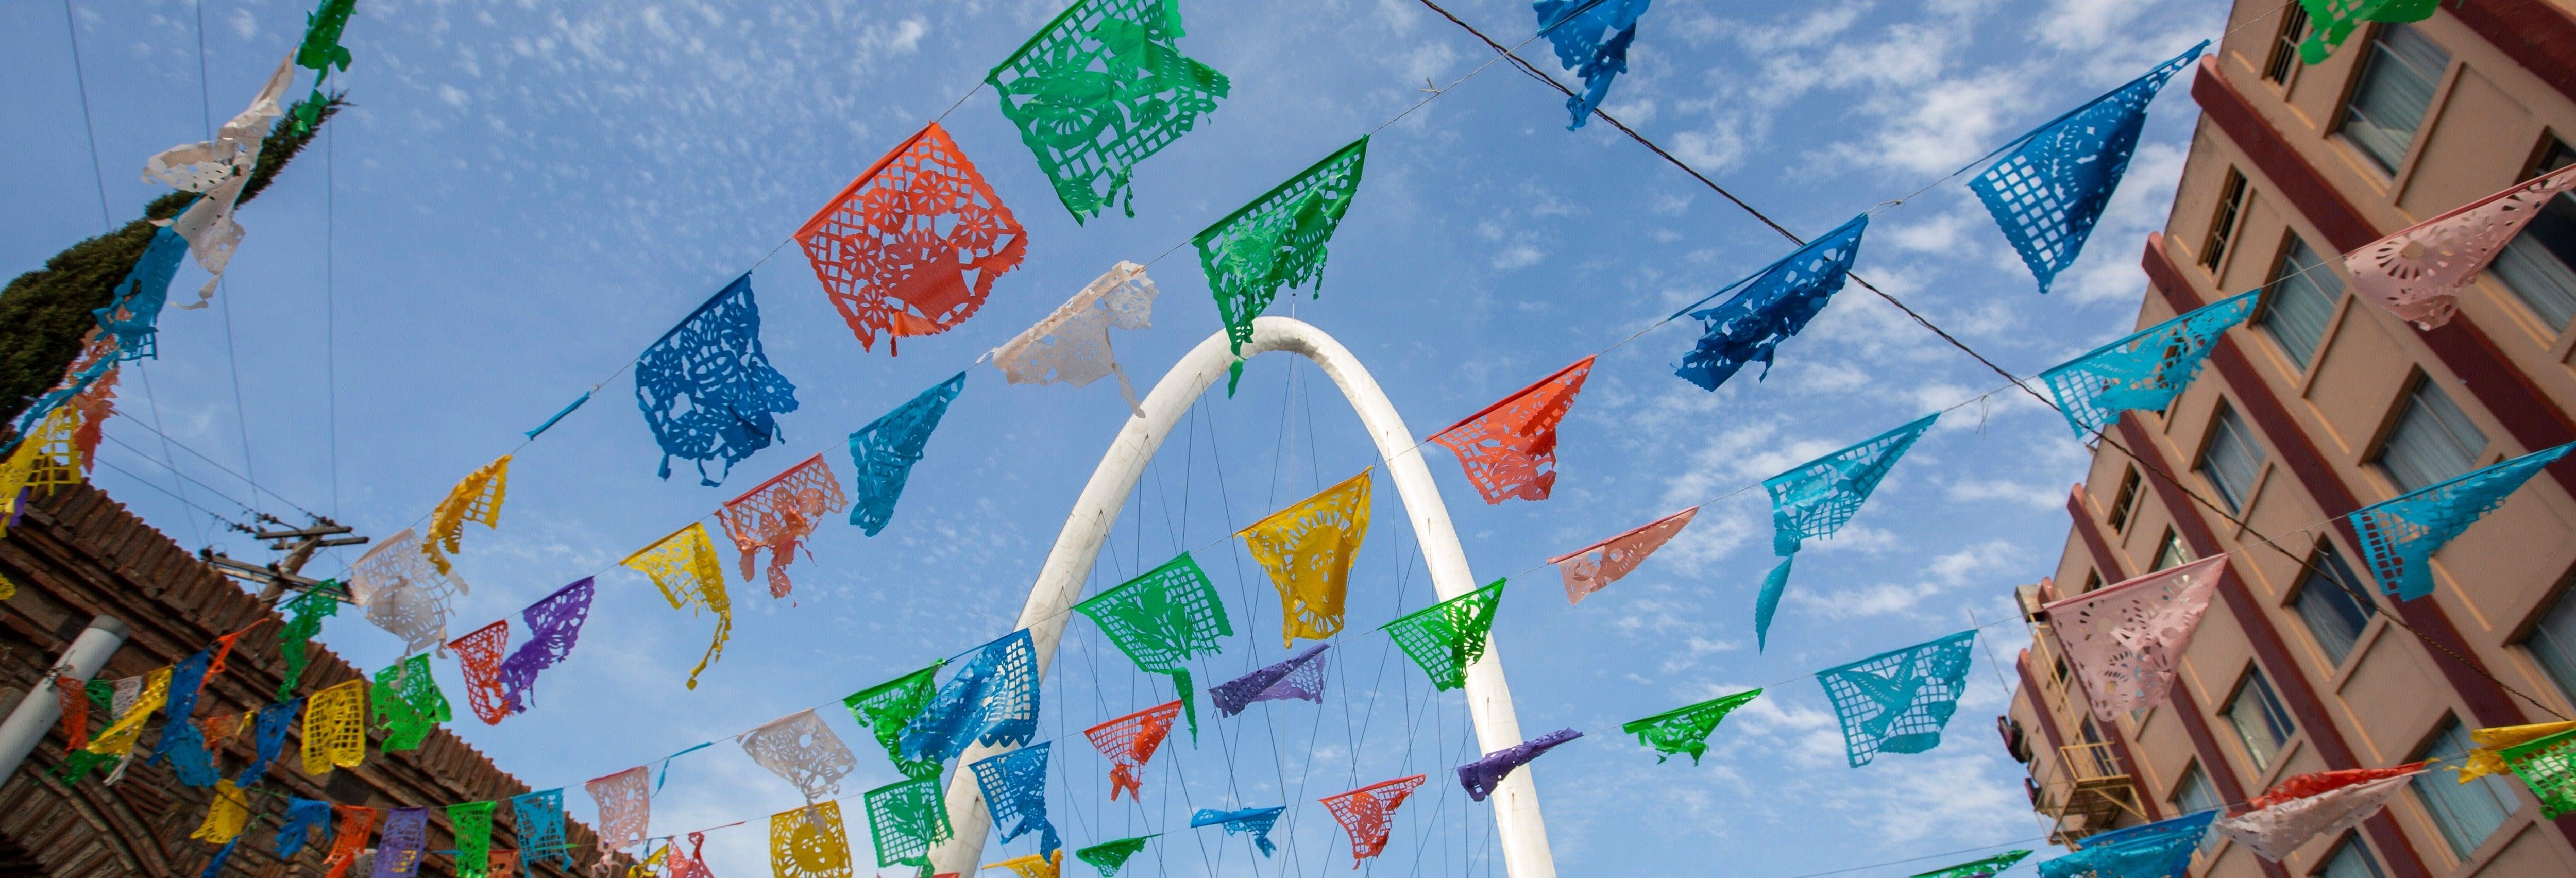 Excursion à Tijuana